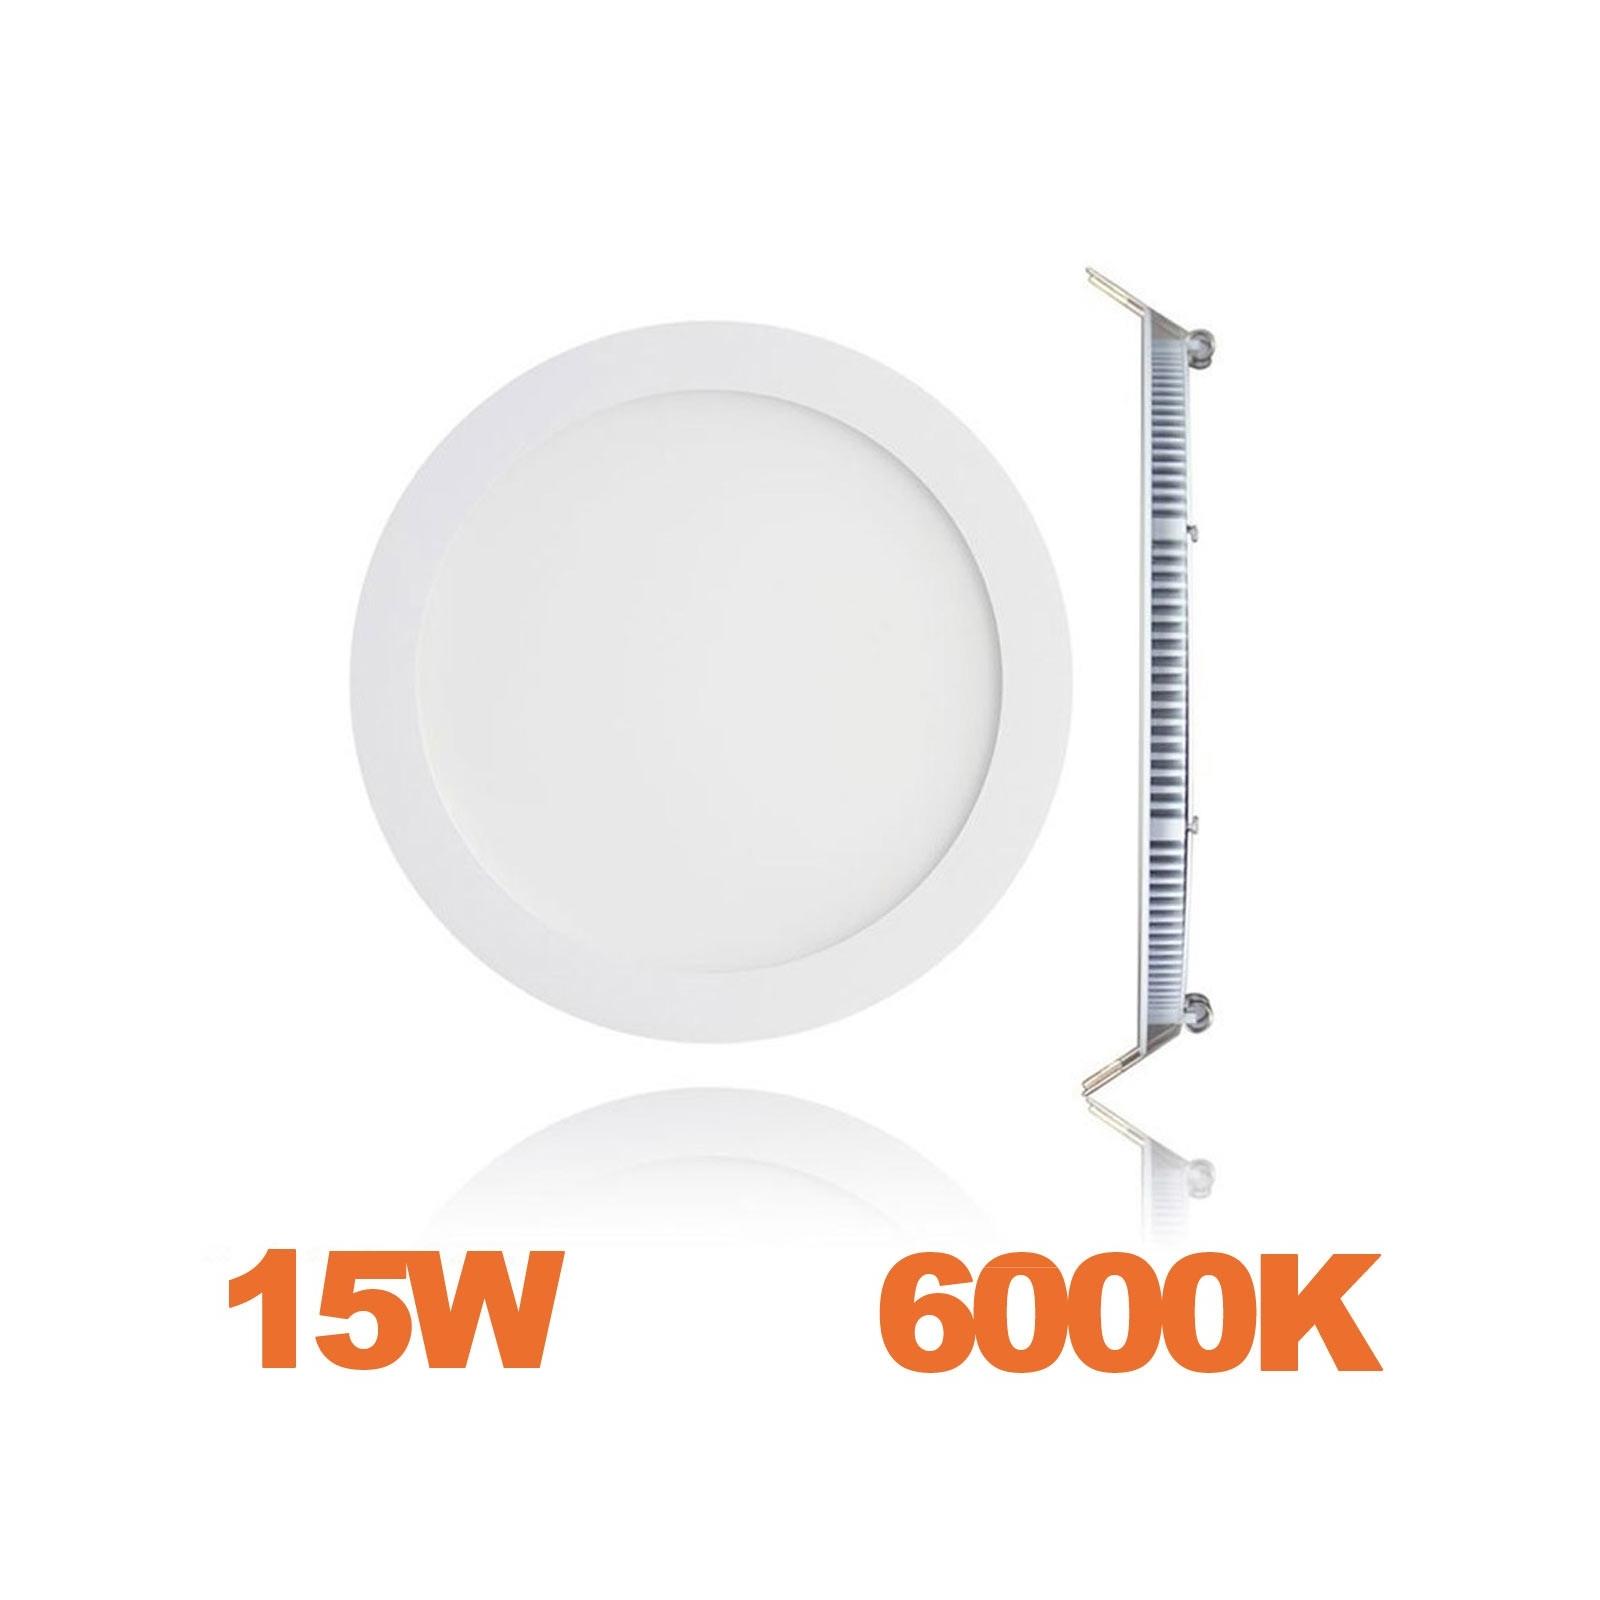 Spot Encastrable LED Downlight Panel Extra-Plat 15W Blanc Froid 6000k